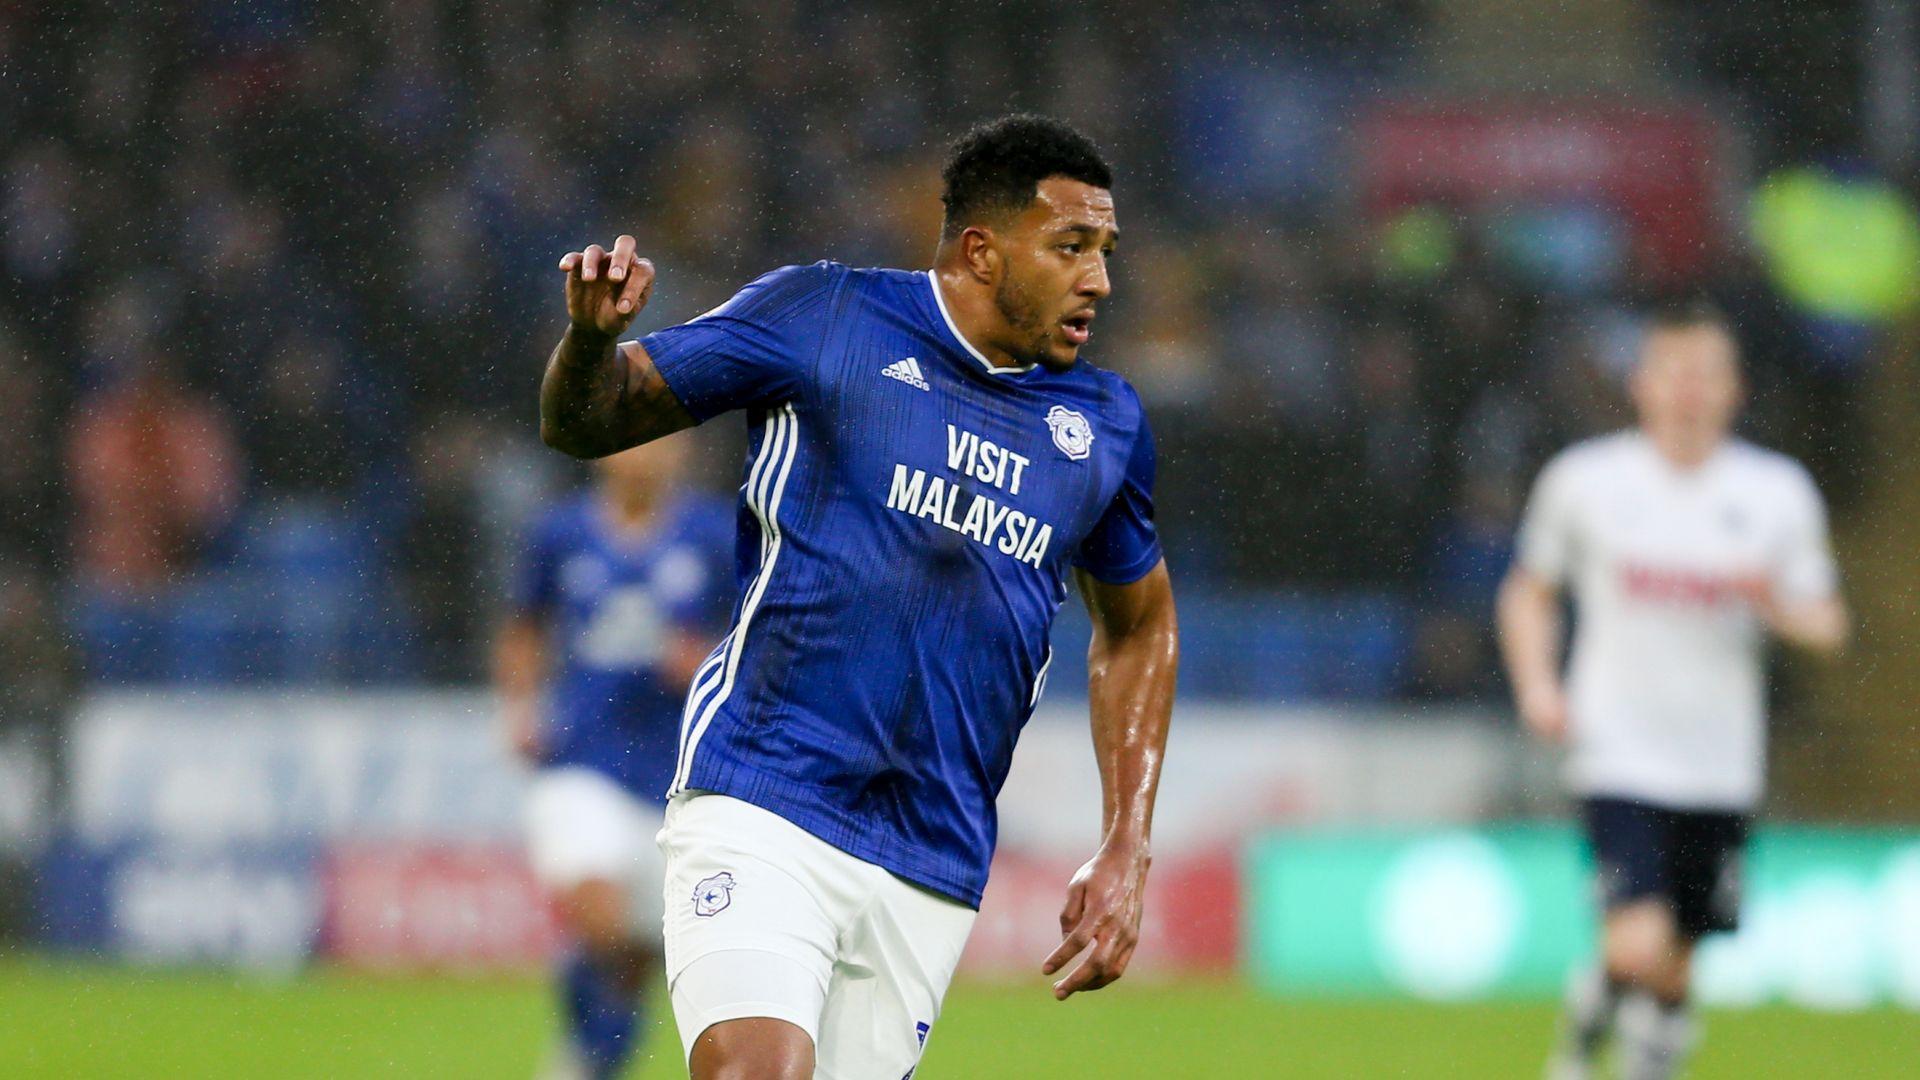 Cardiff terminate Mendez-Laing contract